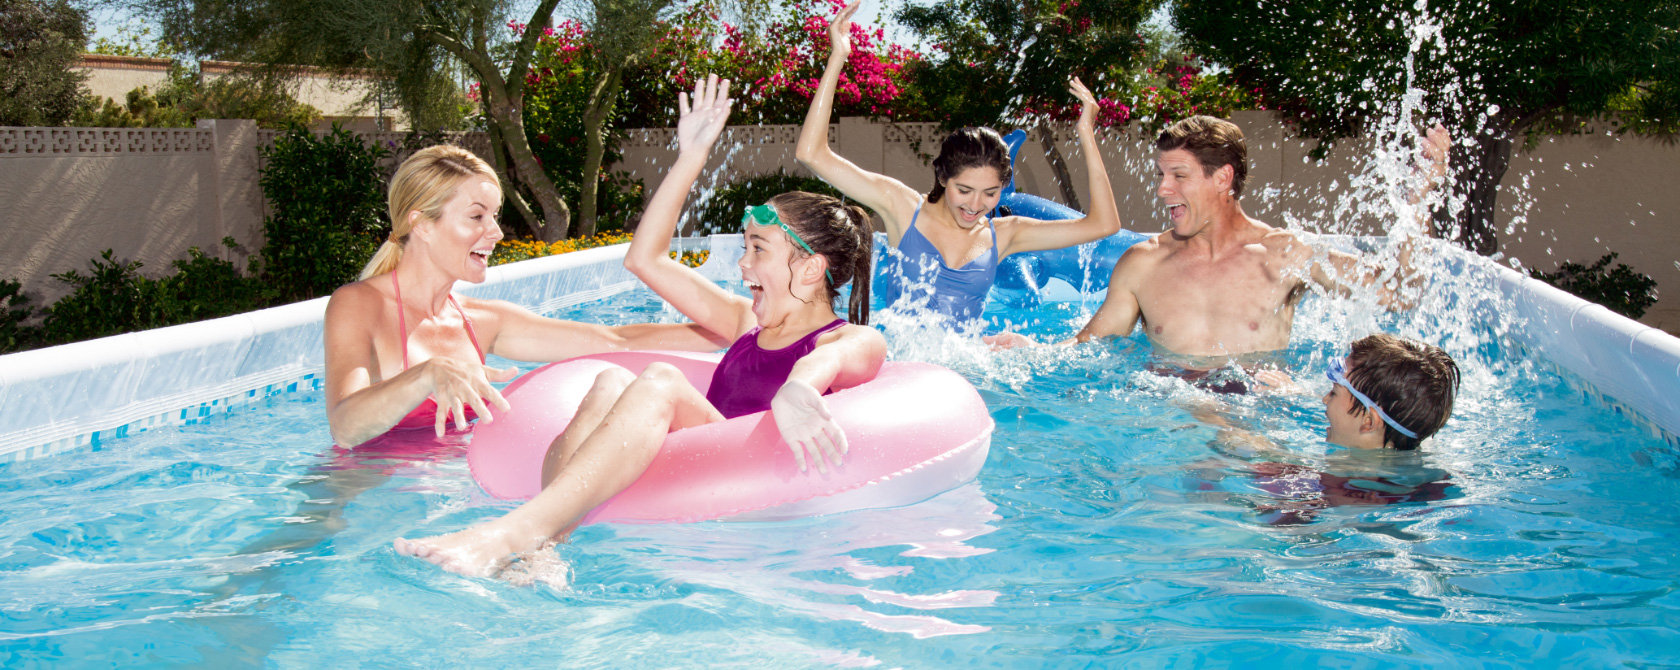 Enjoying our pools